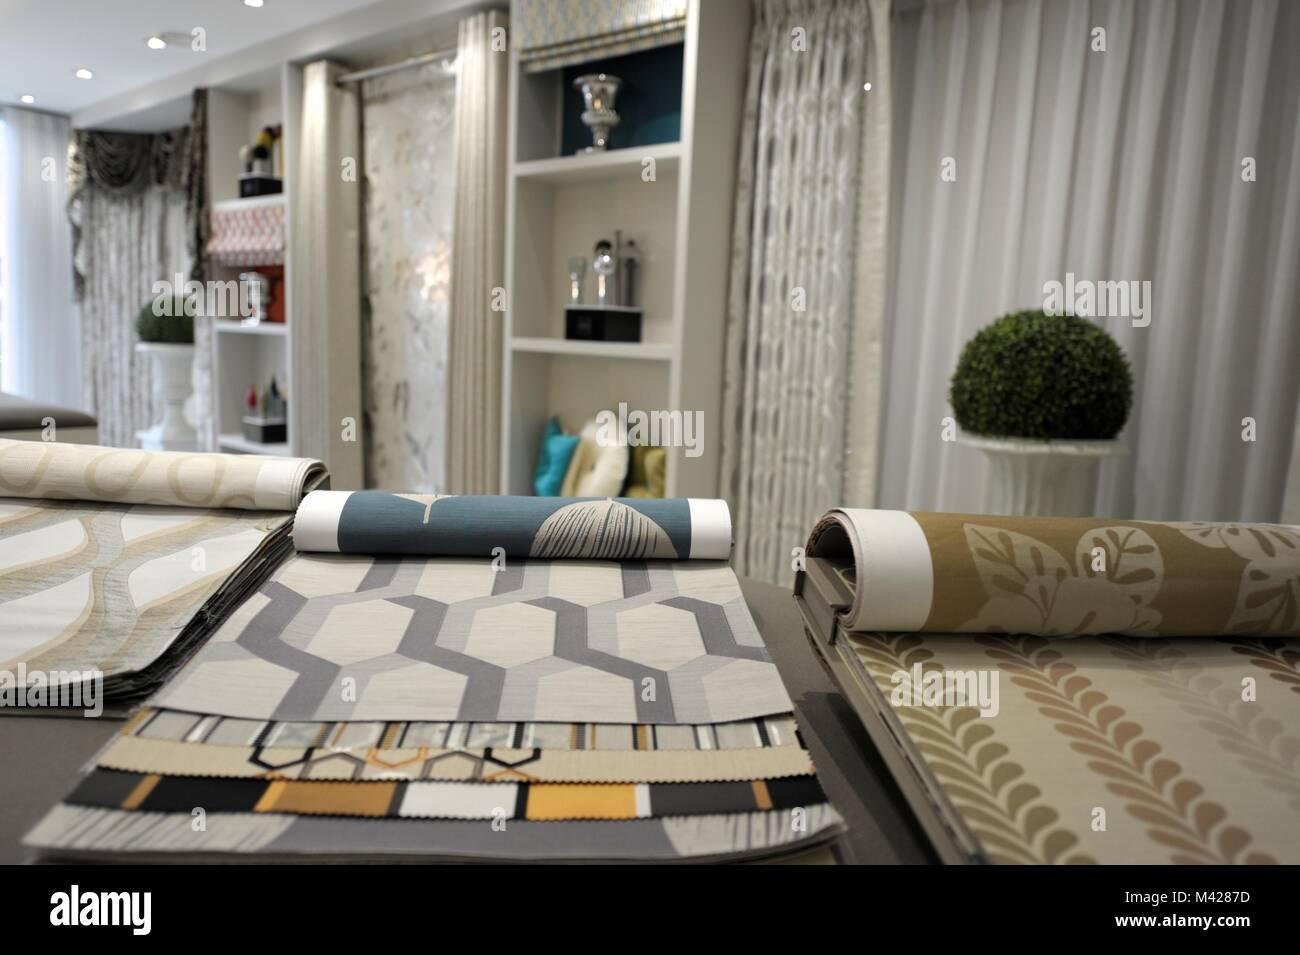 Interior Design Showroom Display Of Materials Stock Photo Alamy